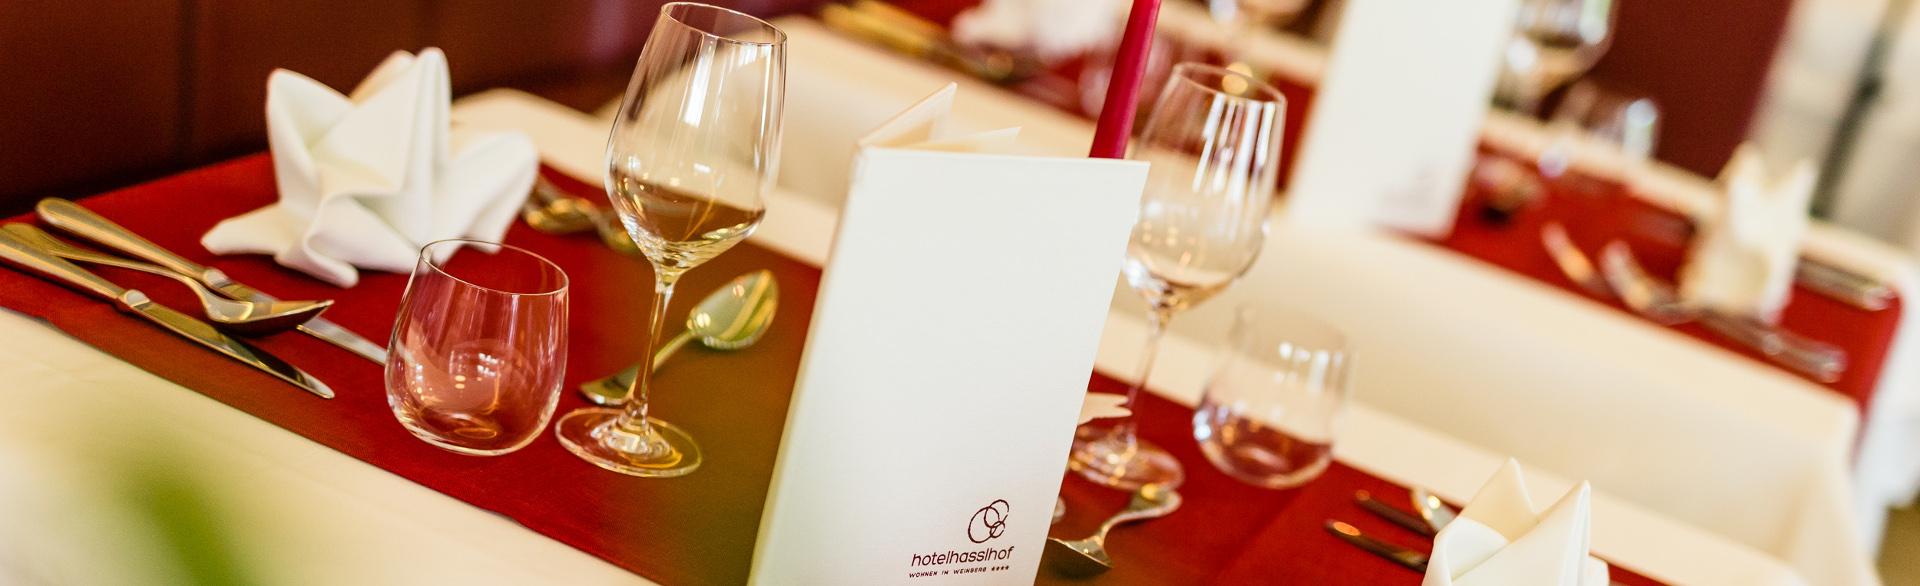 Speisesaal im Hasslhof: Das Kalterer See Hotel mit Gourmet Halbpension